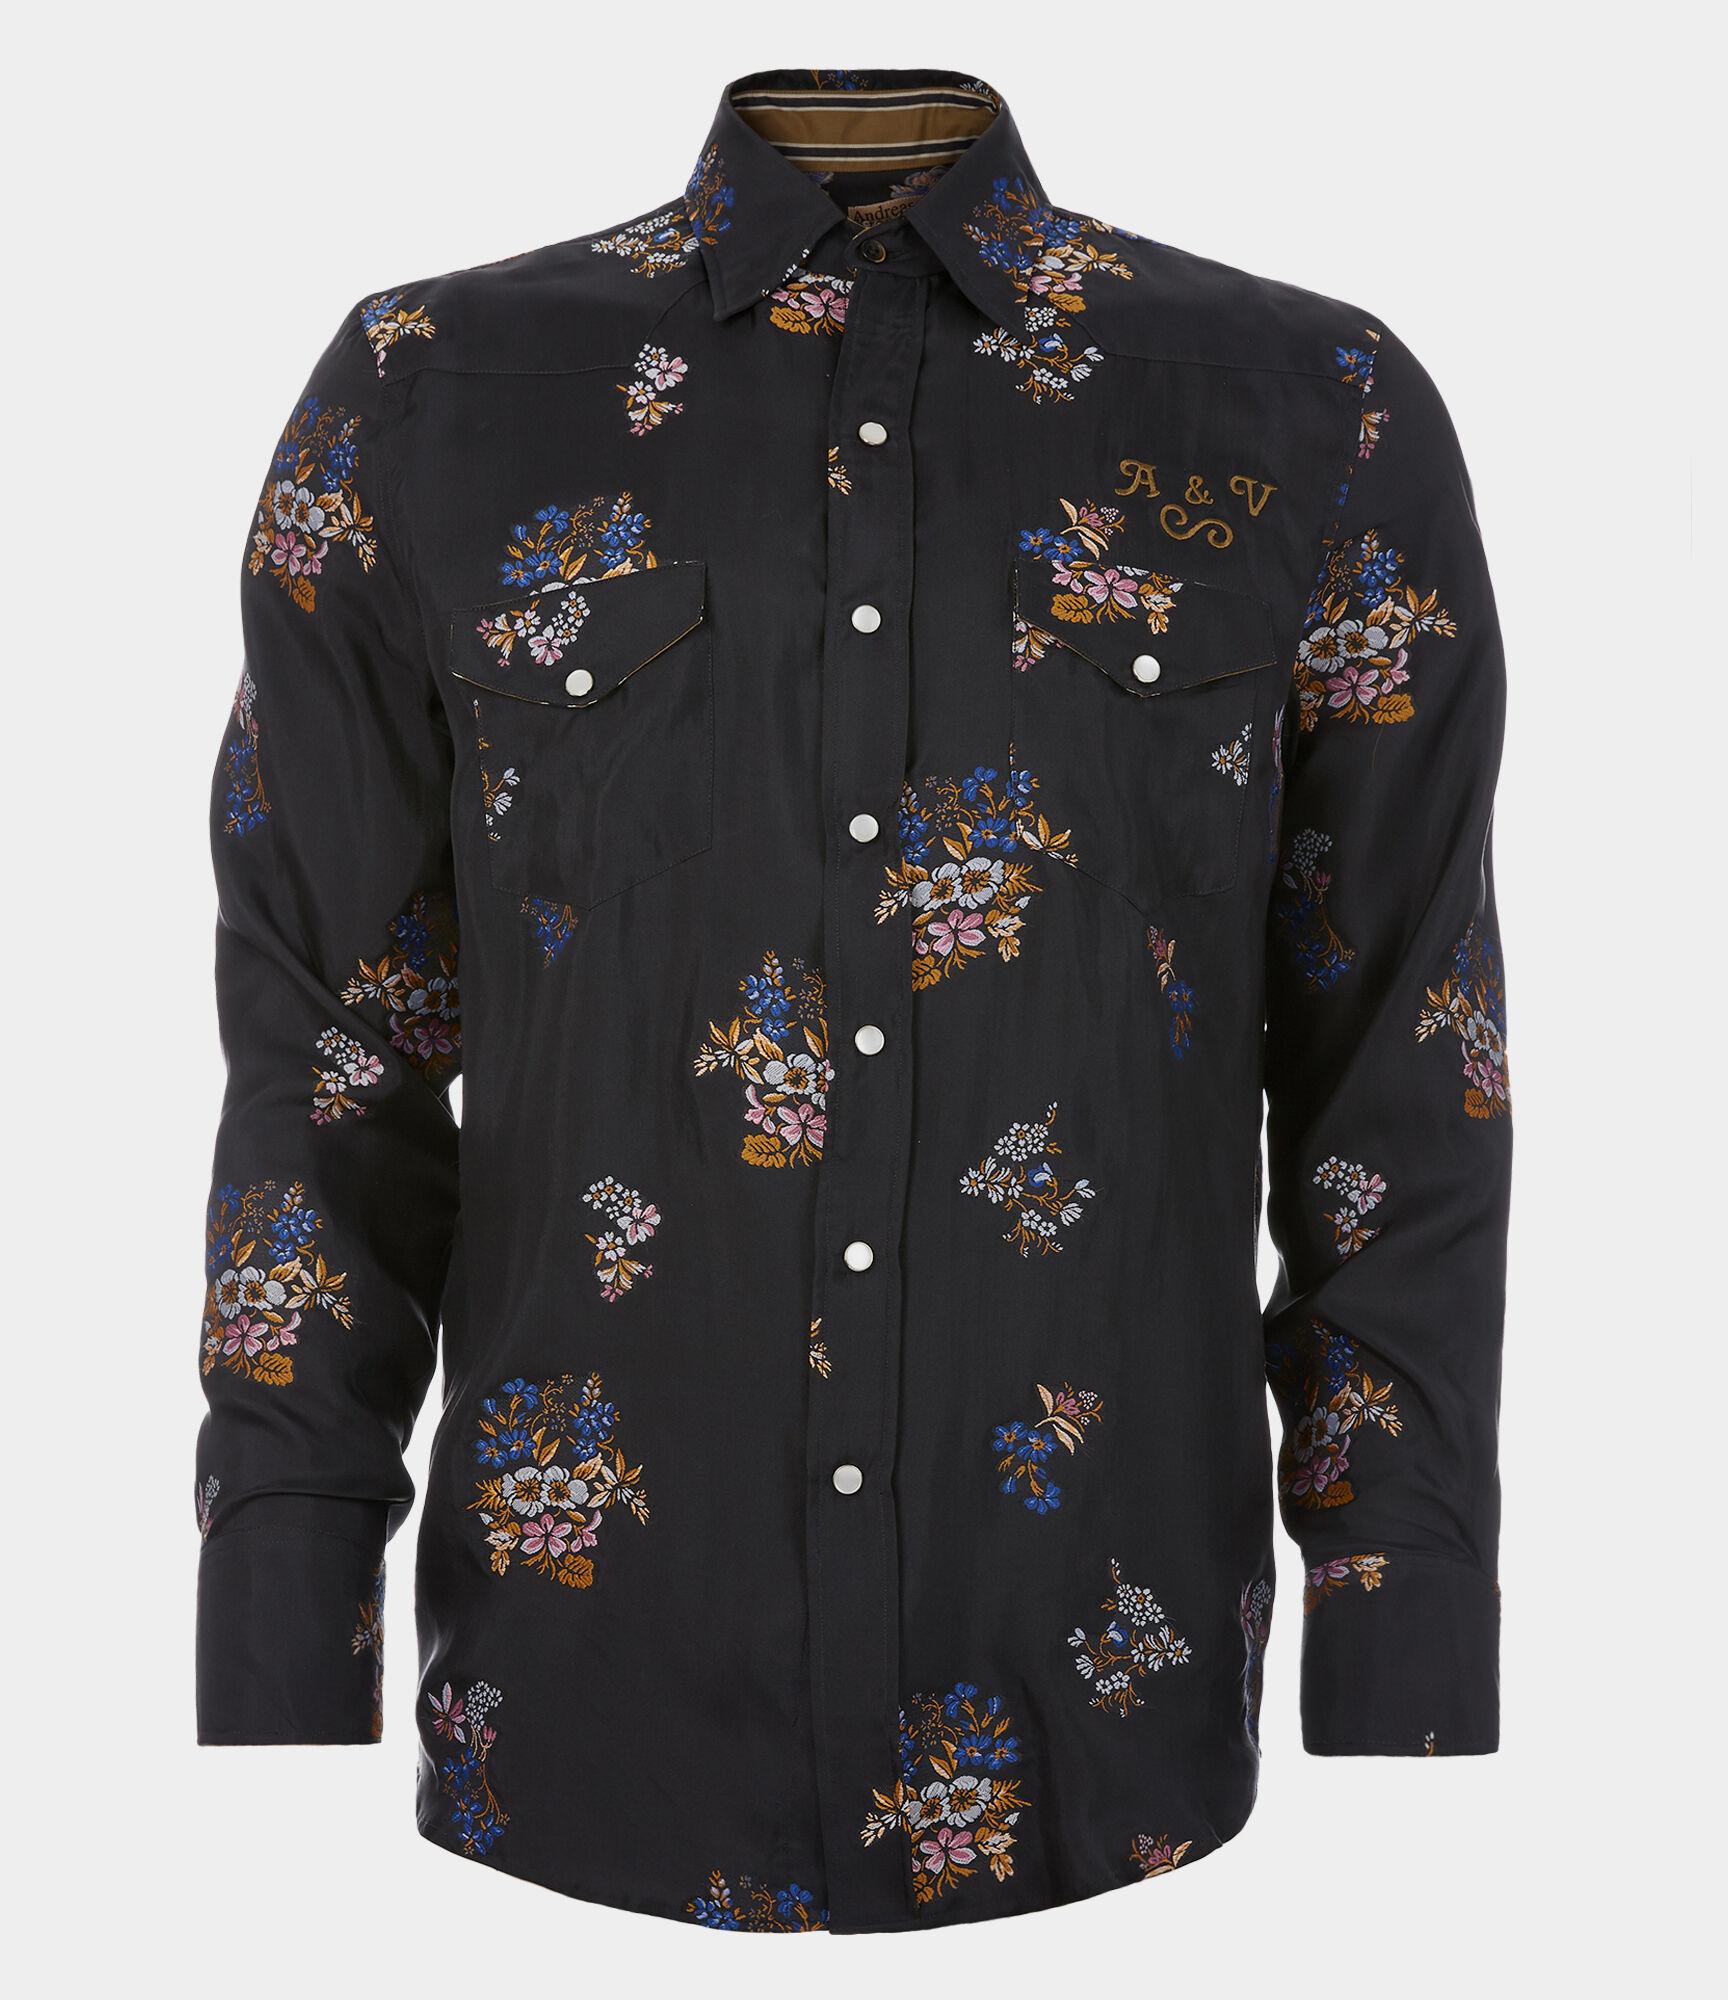 Sid shirt floral silk jacquard also designer men   clothing menswear vivienne westwood rh viviennewestwood